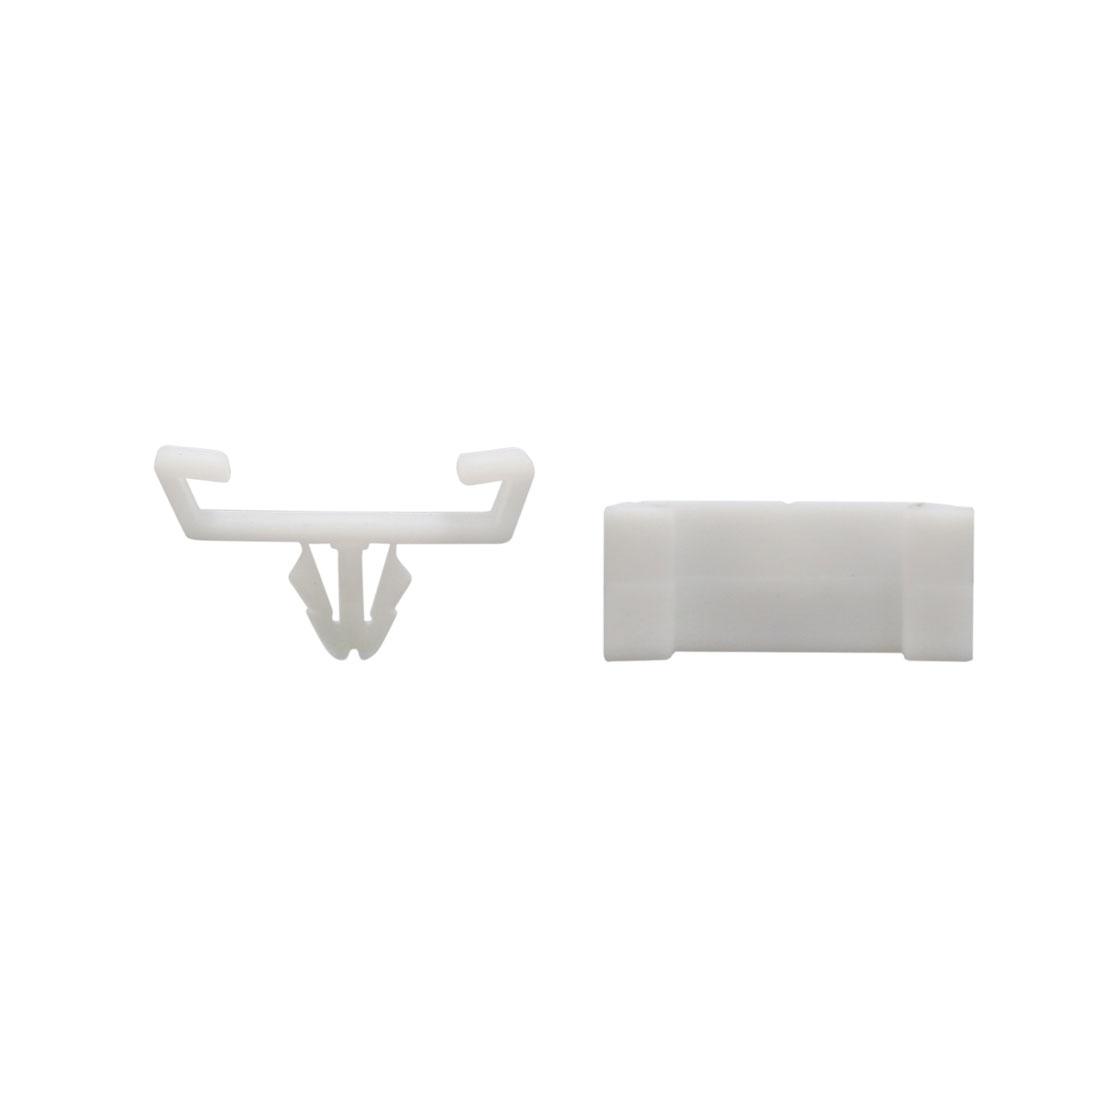 50Pcs White Plastic Rivets Door Fender Moulding Fasteners 11mm for Auto Car